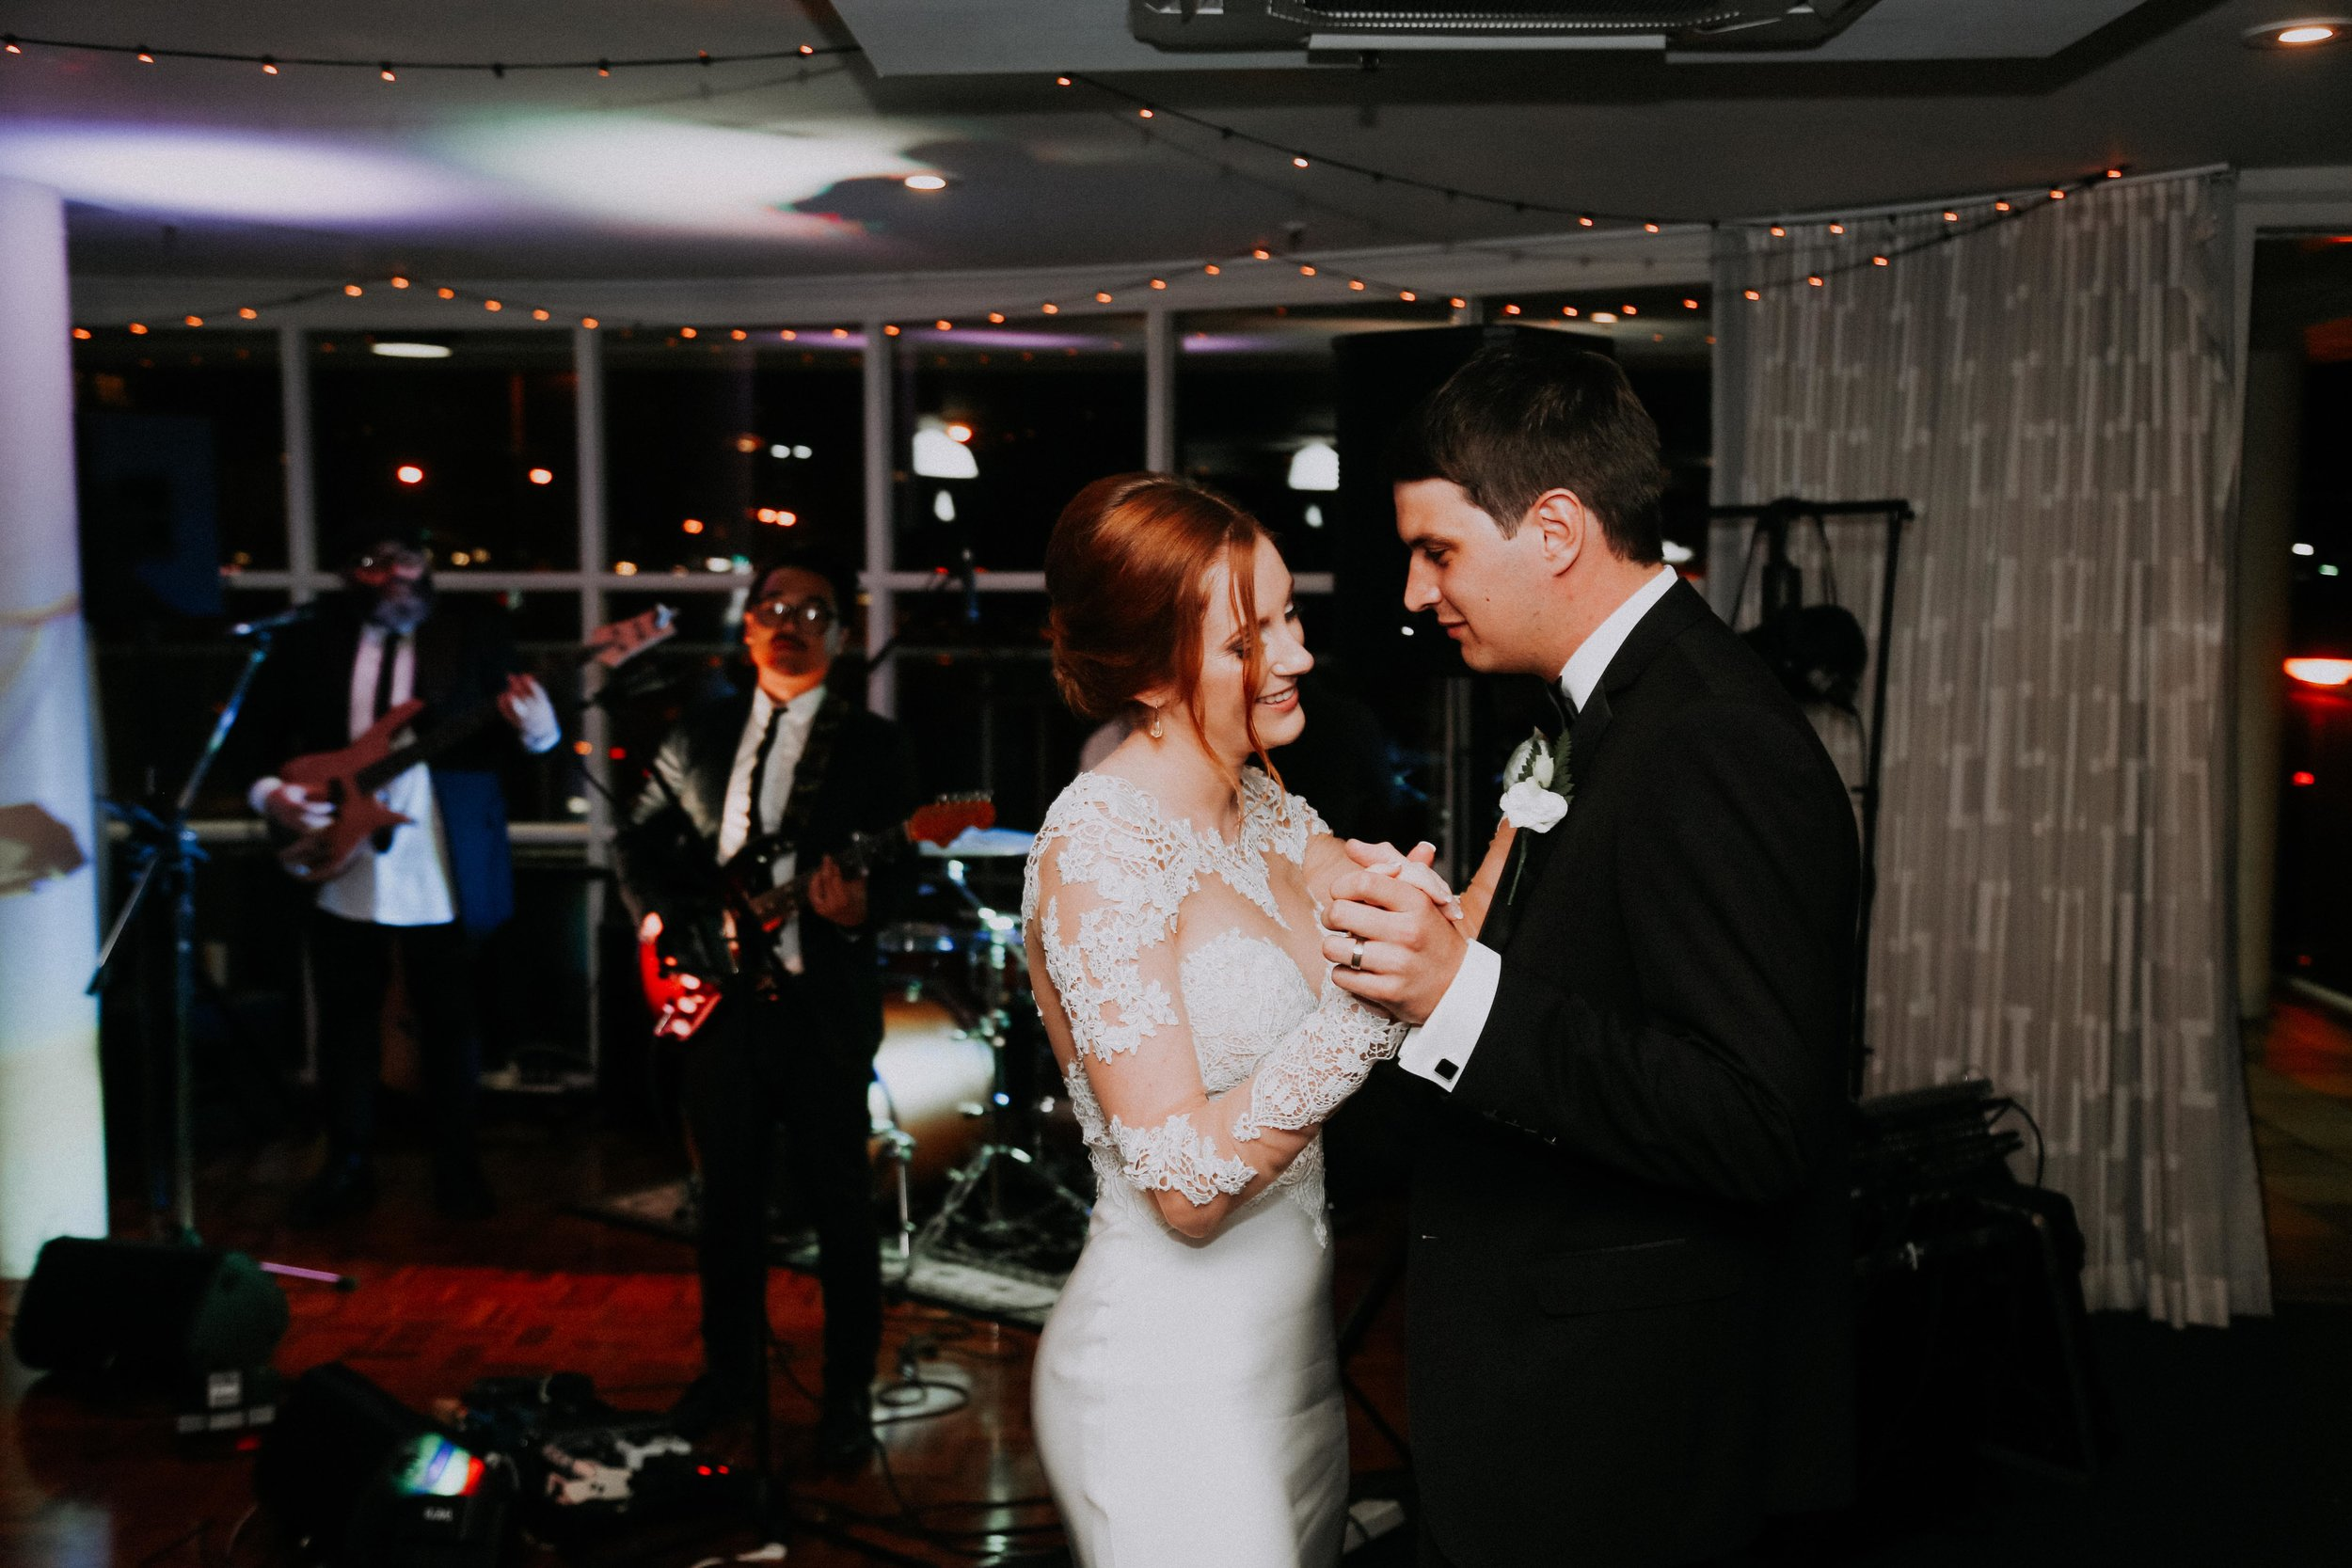 Monique + Nick Vincent - Wedding Photos FINALS-468.jpg